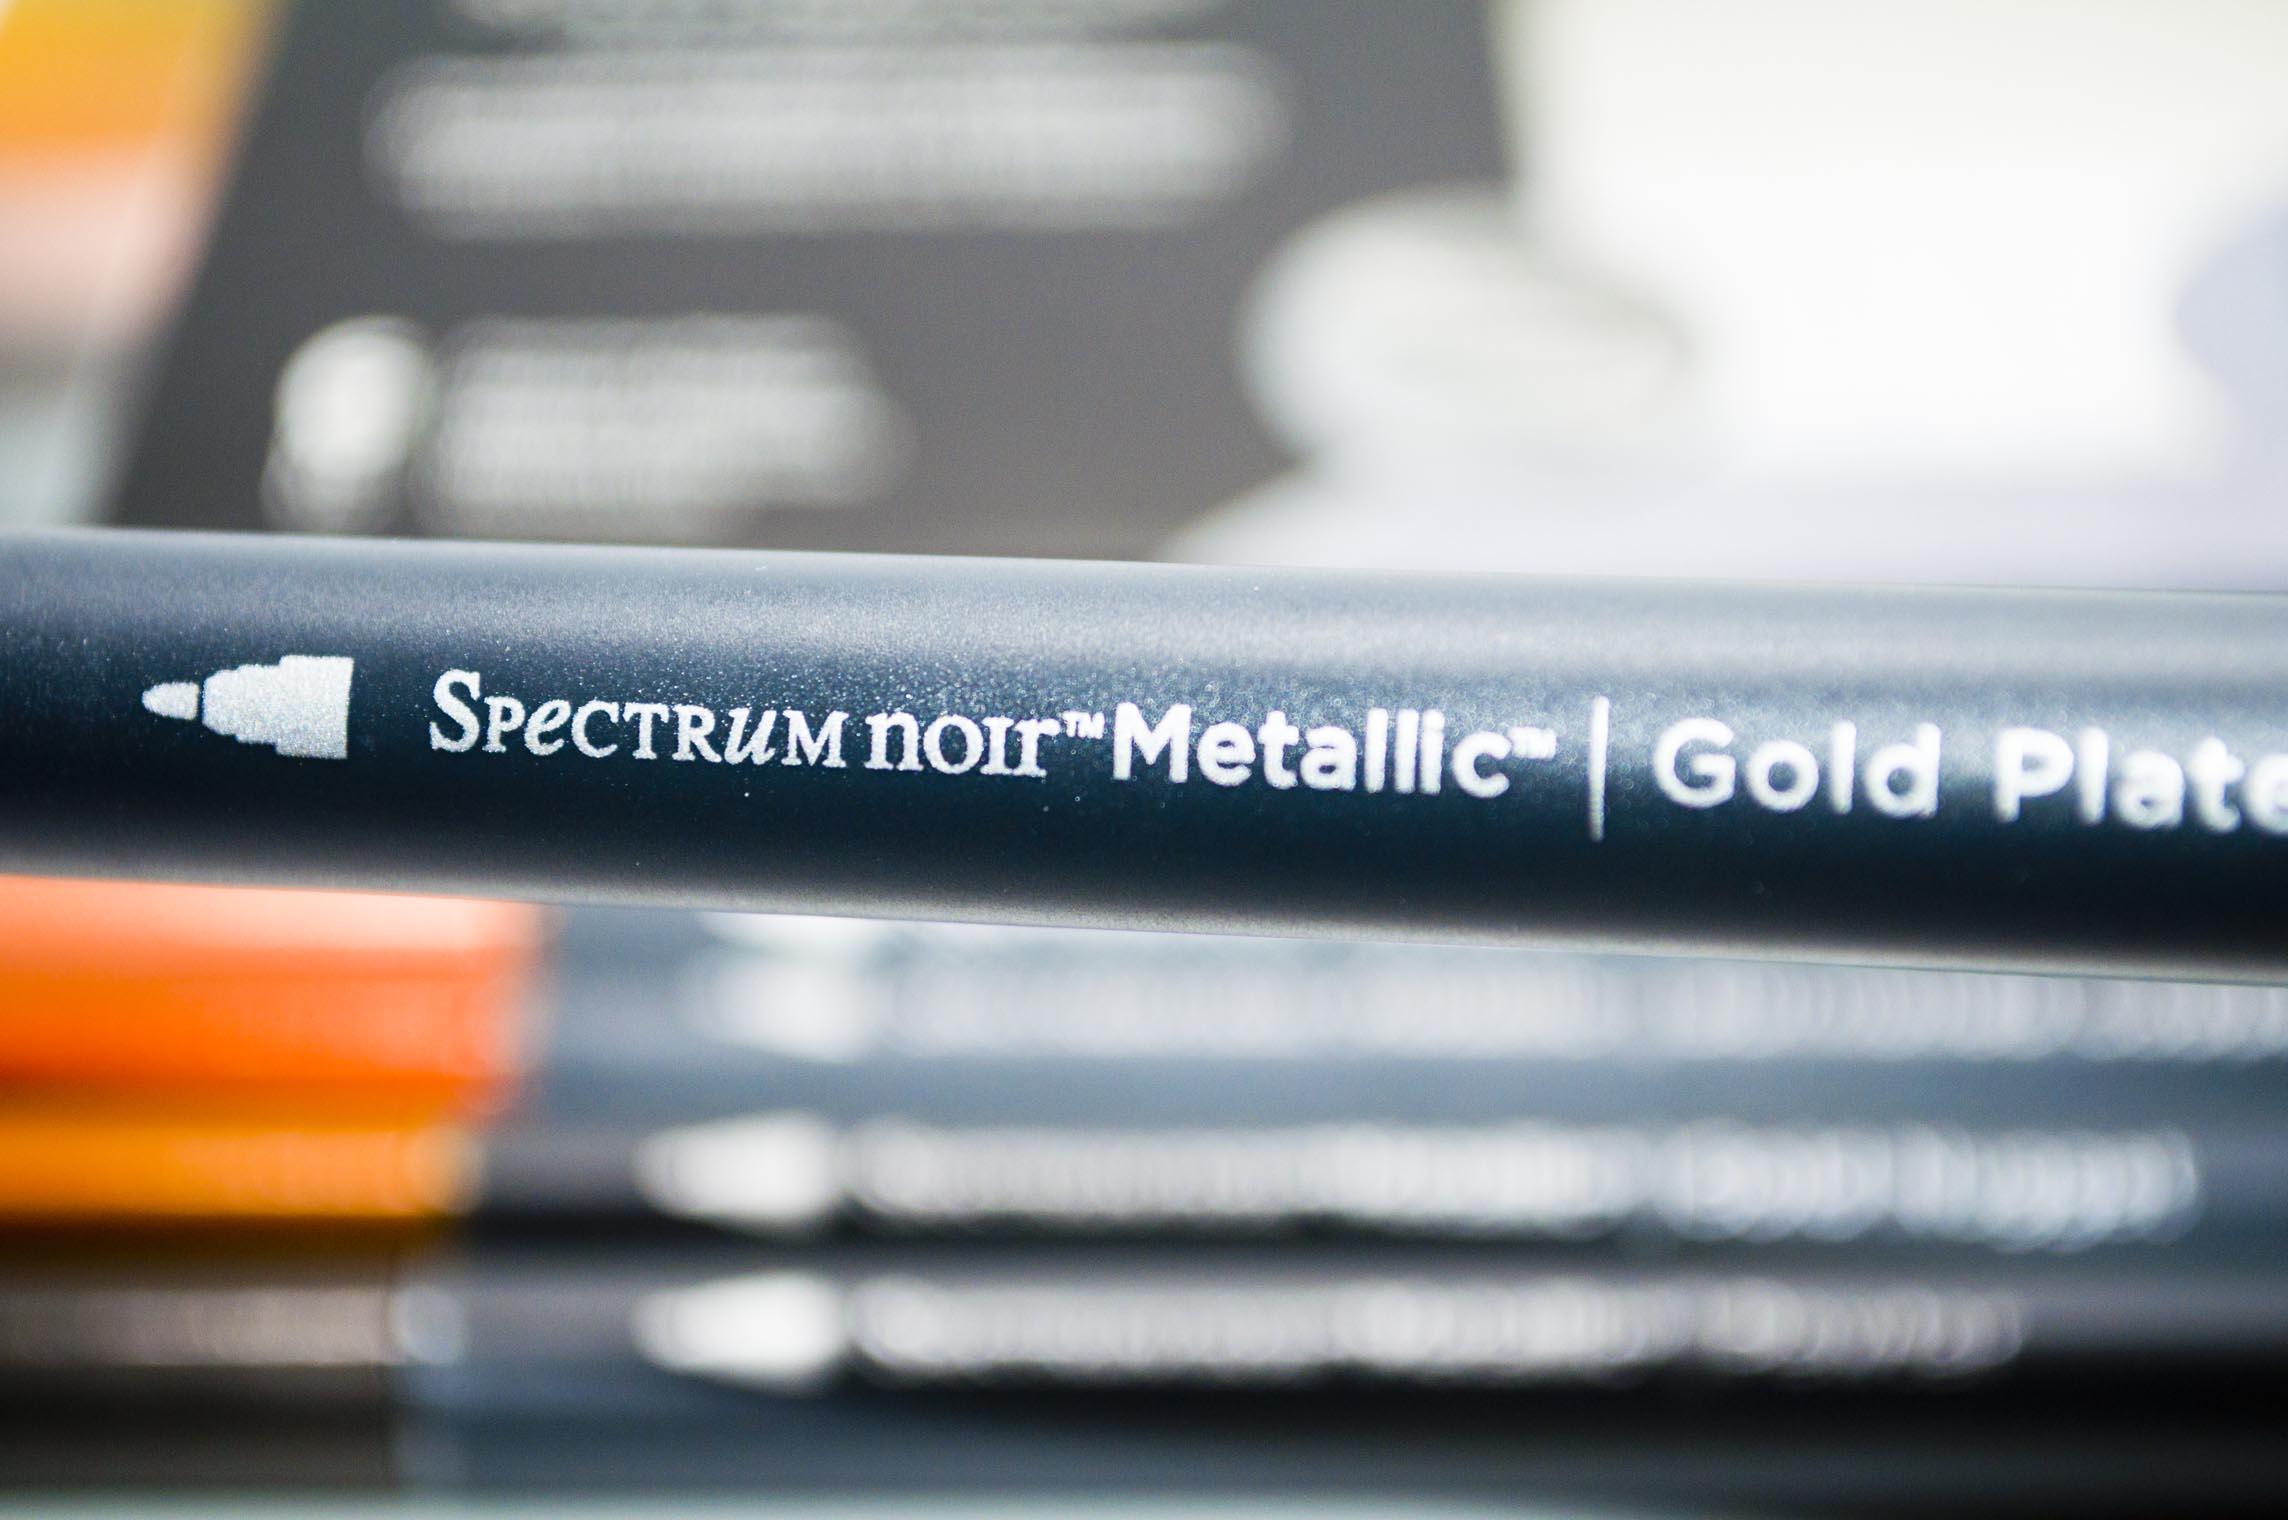 Spectrum Noir Metallic Name on BArrel .jpg